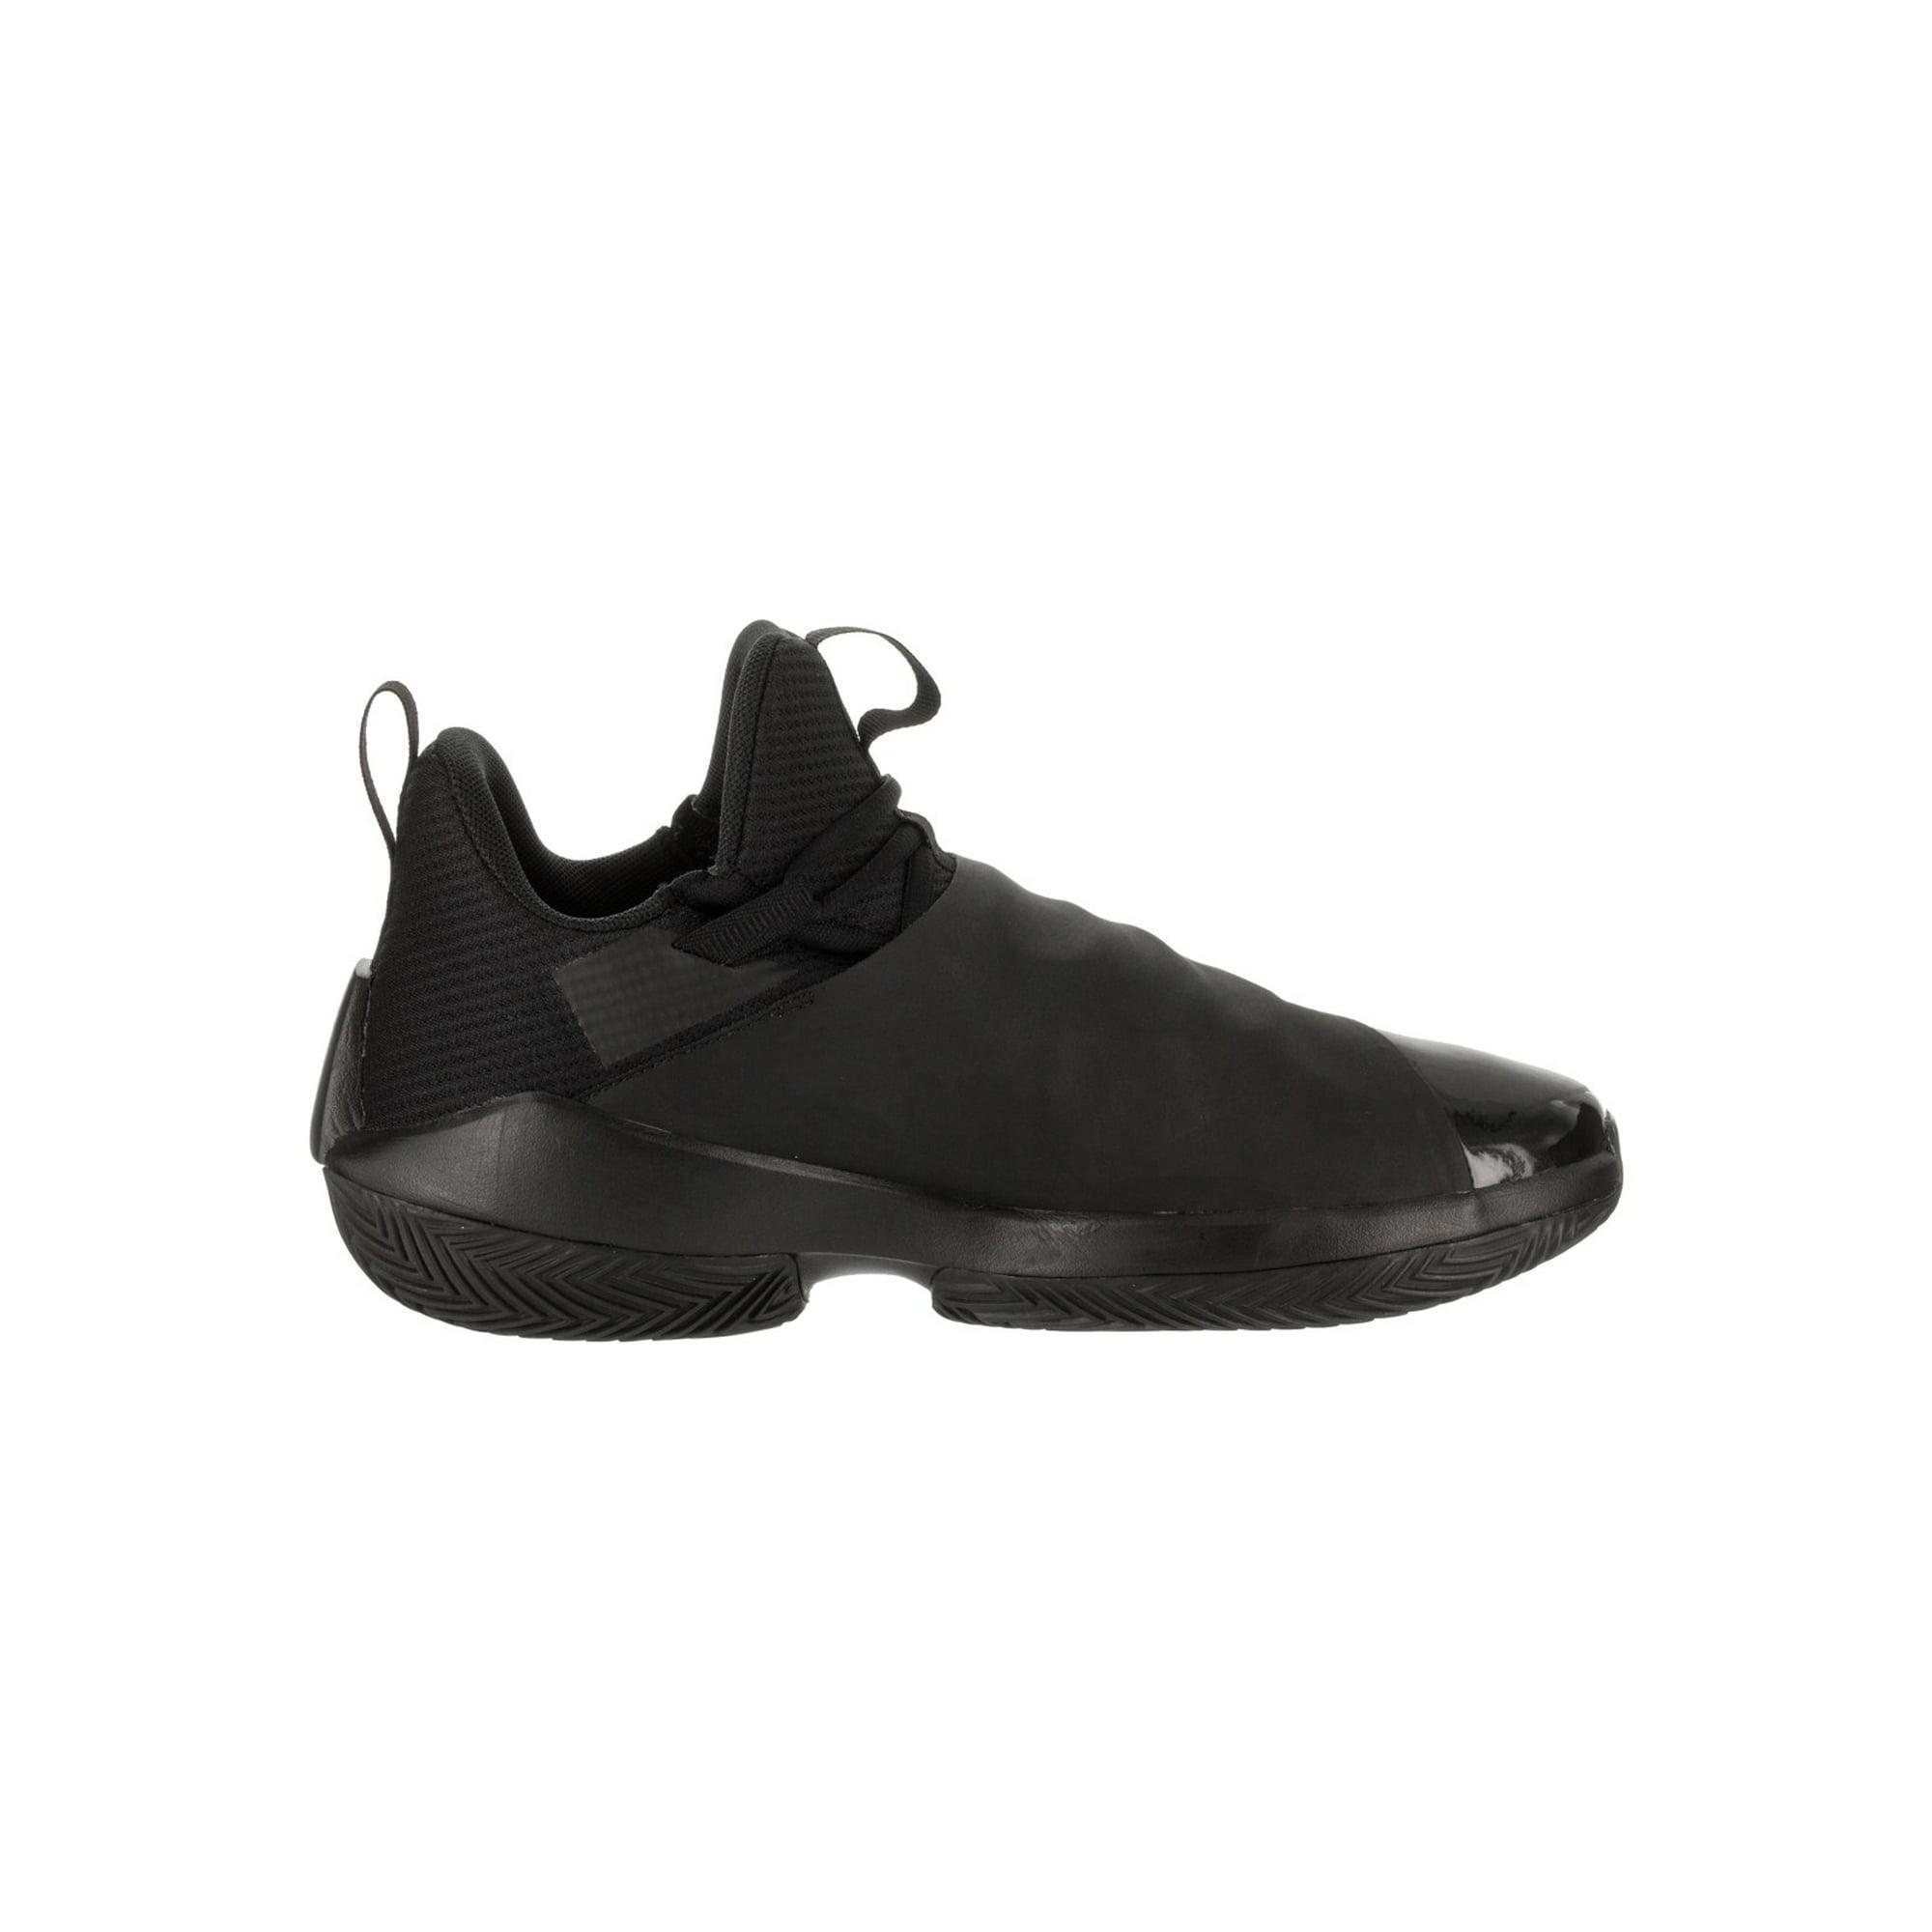 e6ba3faf745 Nike Jordan Men s Jordan Jumpman Hustle Basketball Shoe